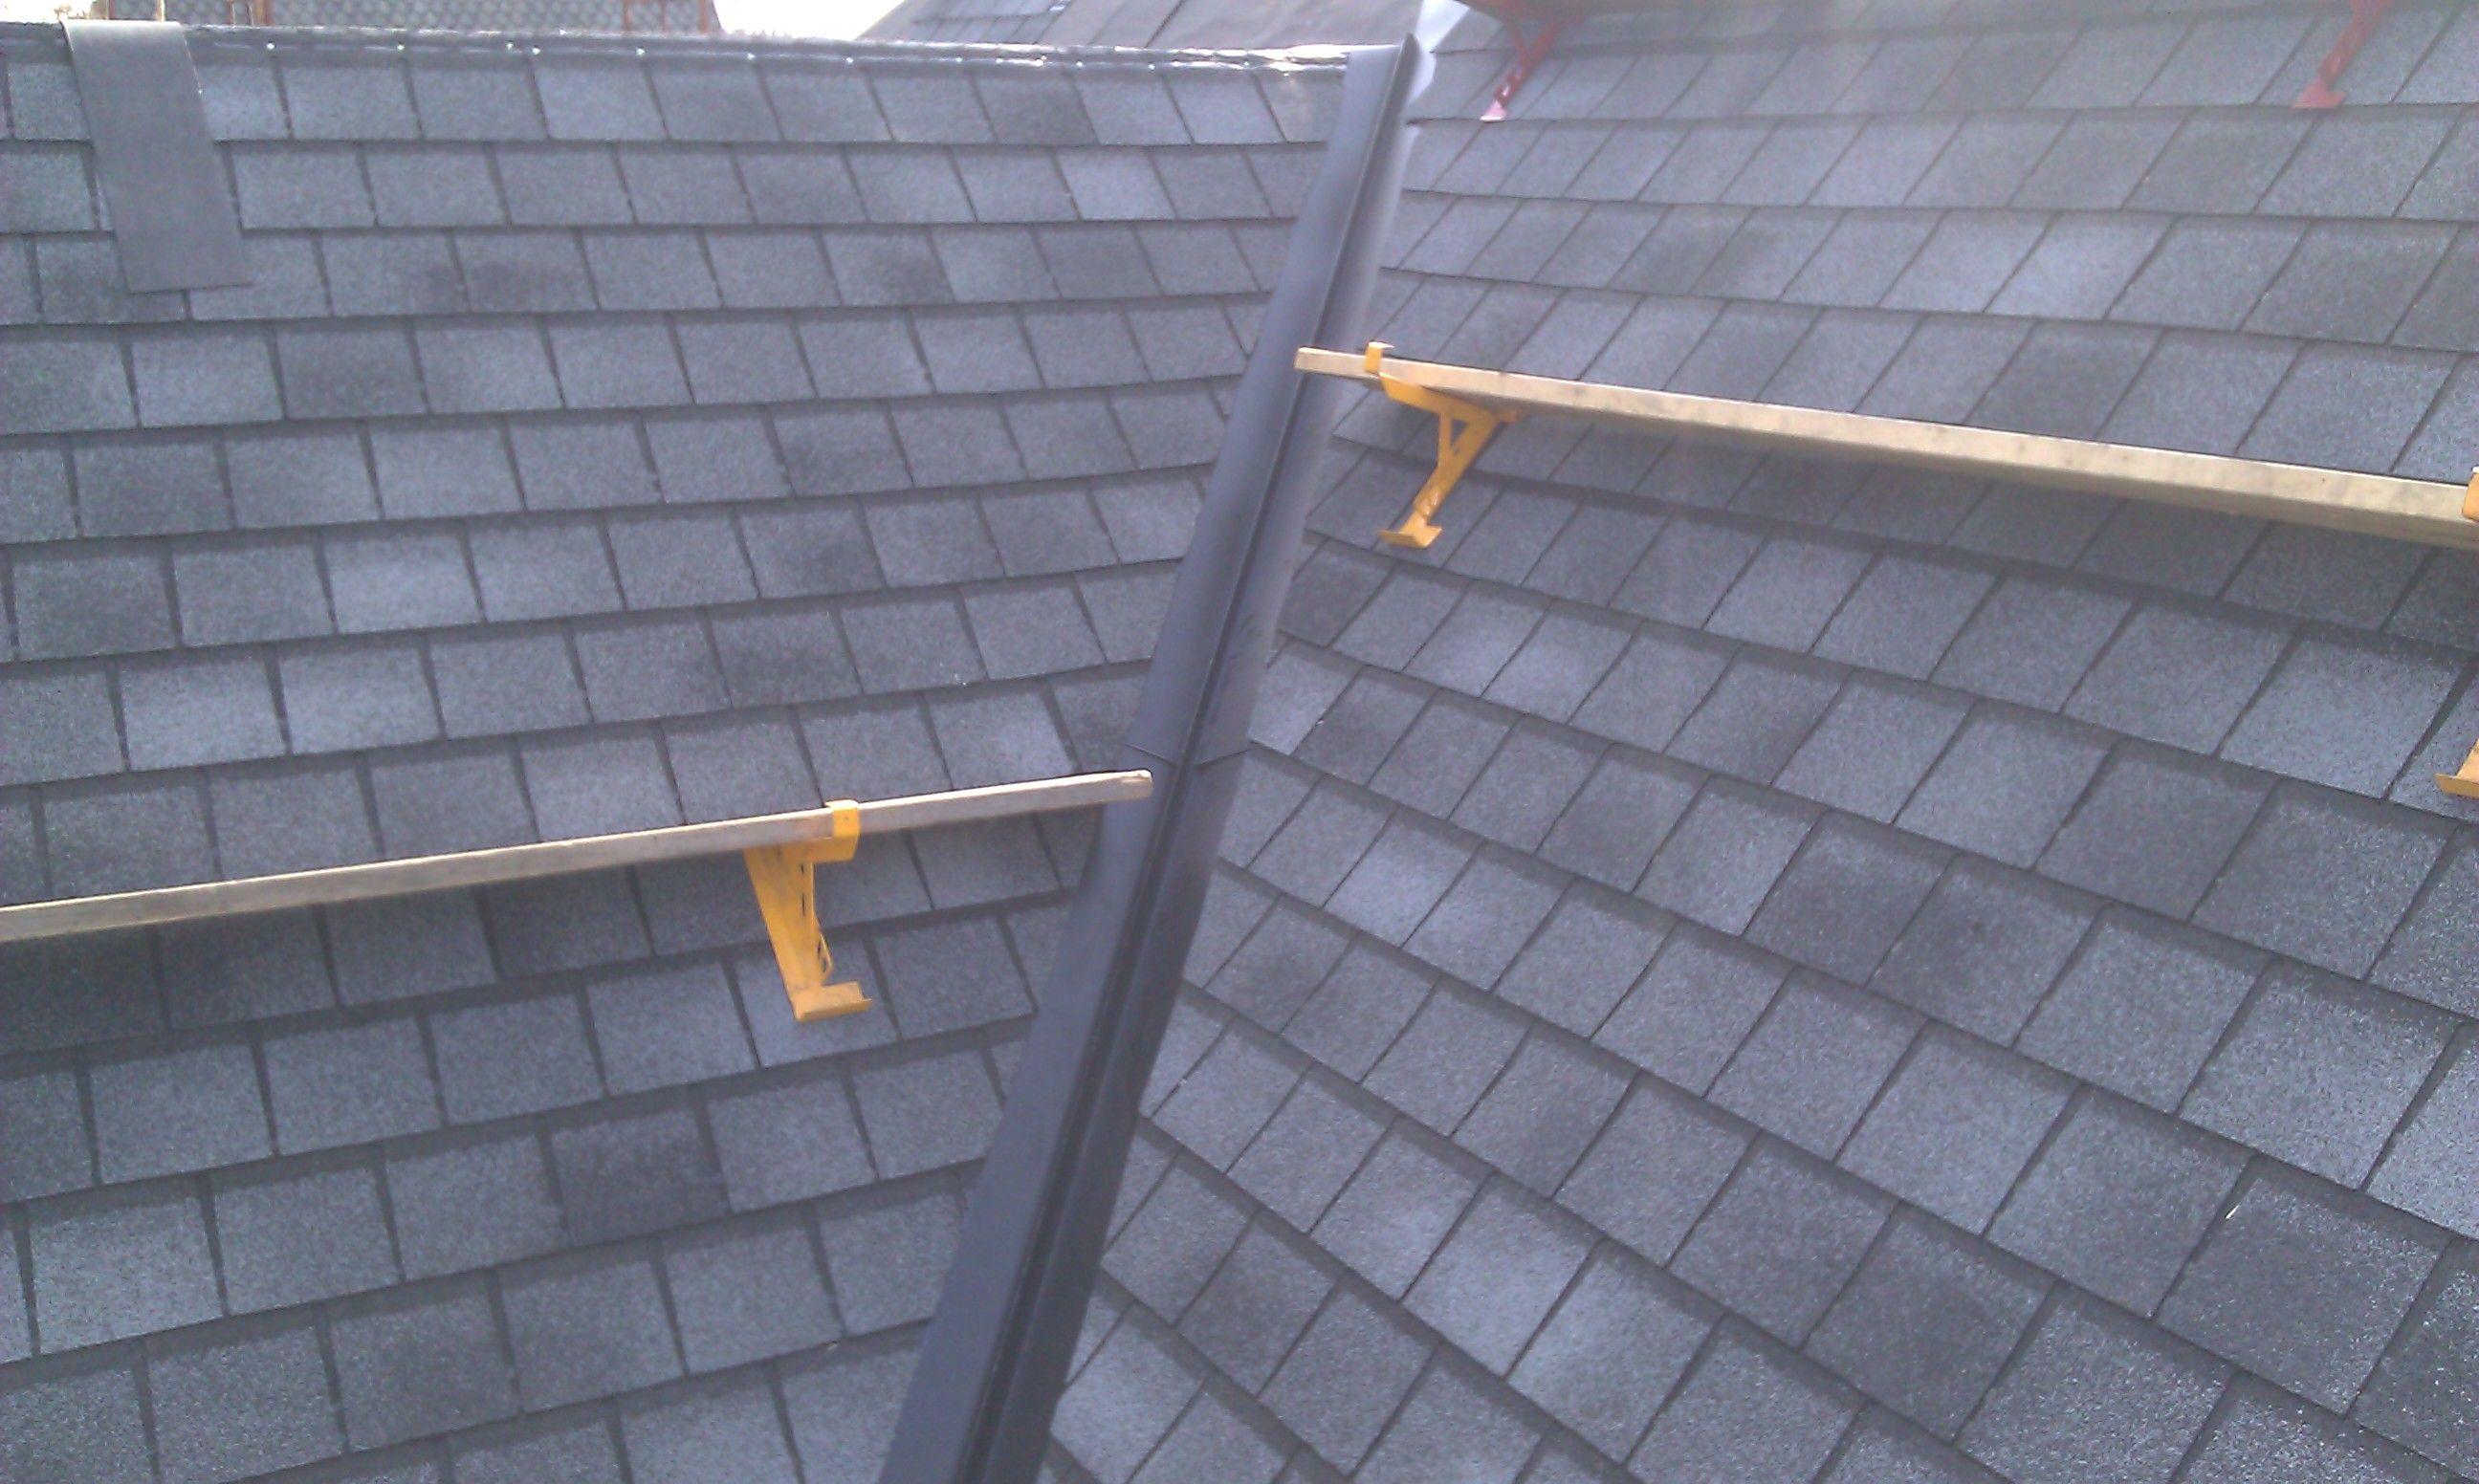 Gaf Slateline Shingles Shingle Colors Roof Shingles House Exterior